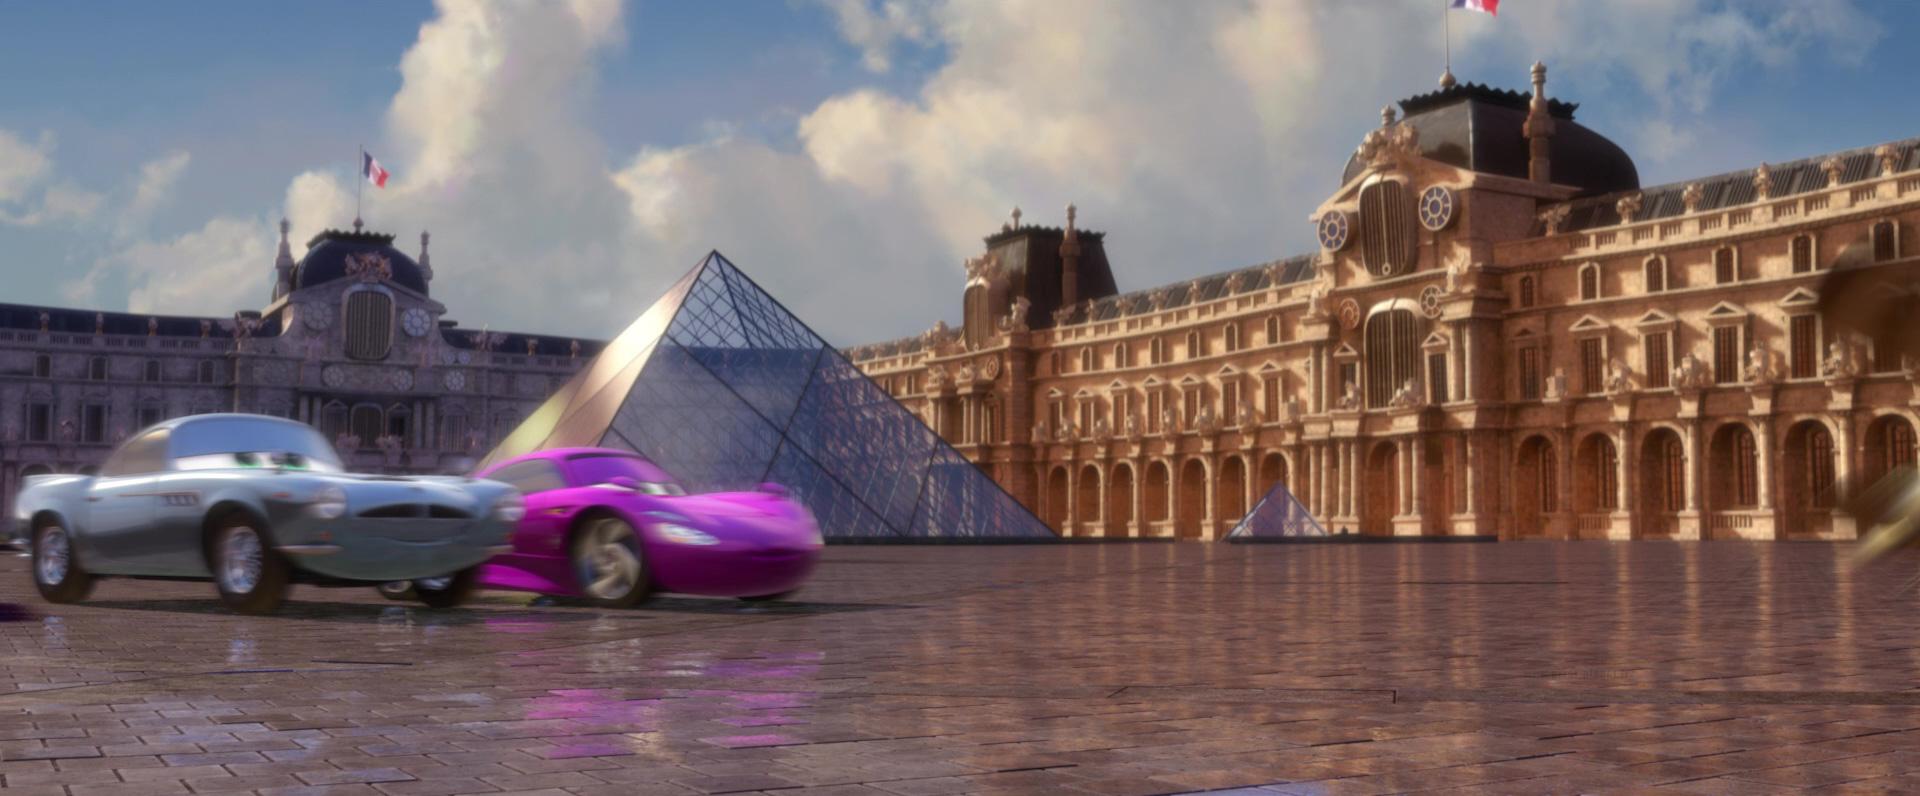 pixar disney cars carisation